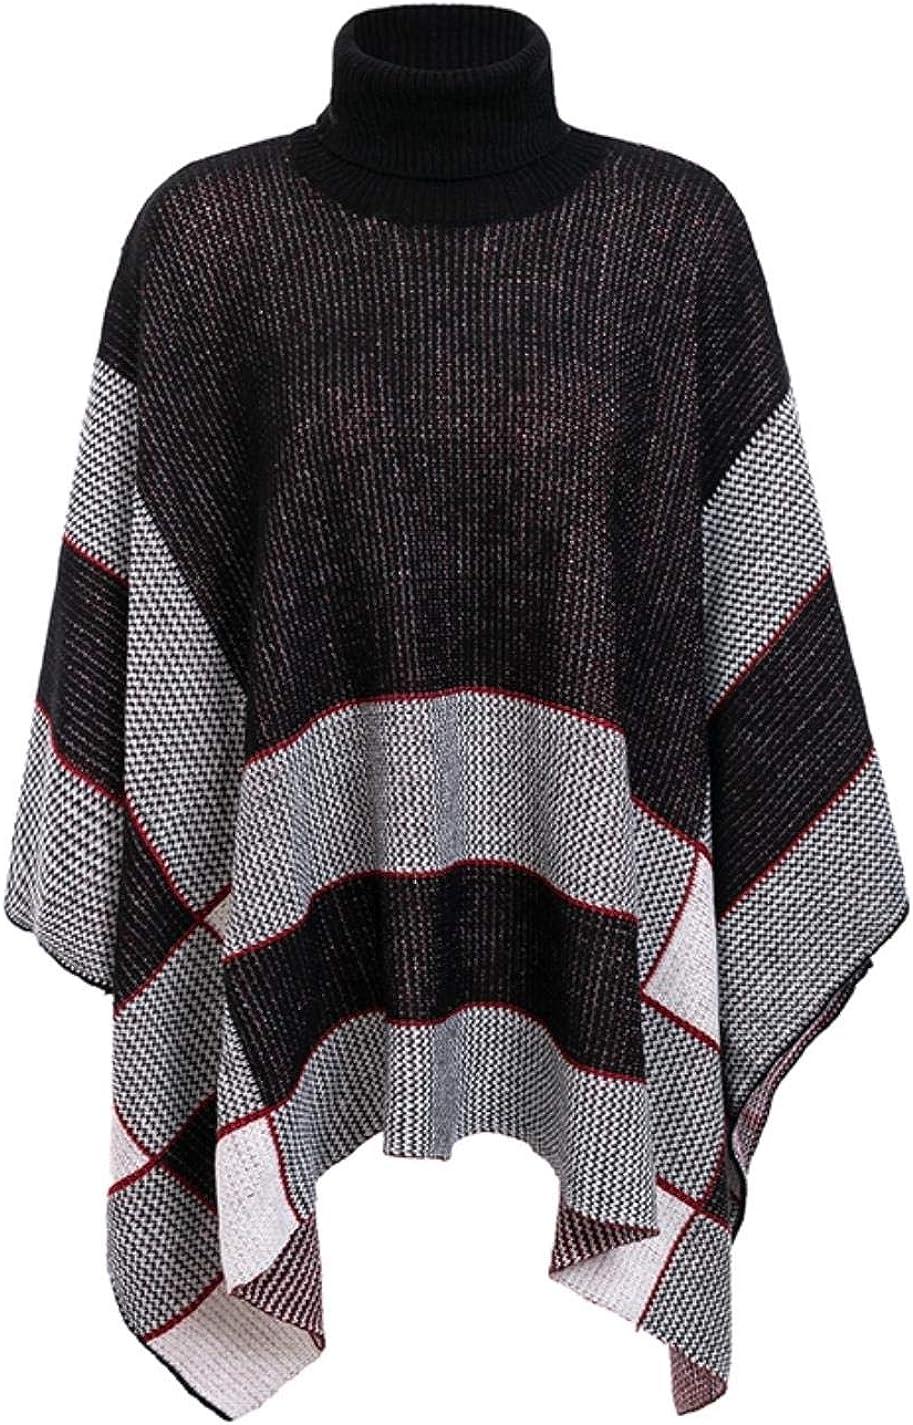 Womens Knit Turtleneck Cape Sweater Black Casual Jumper Street Sweater